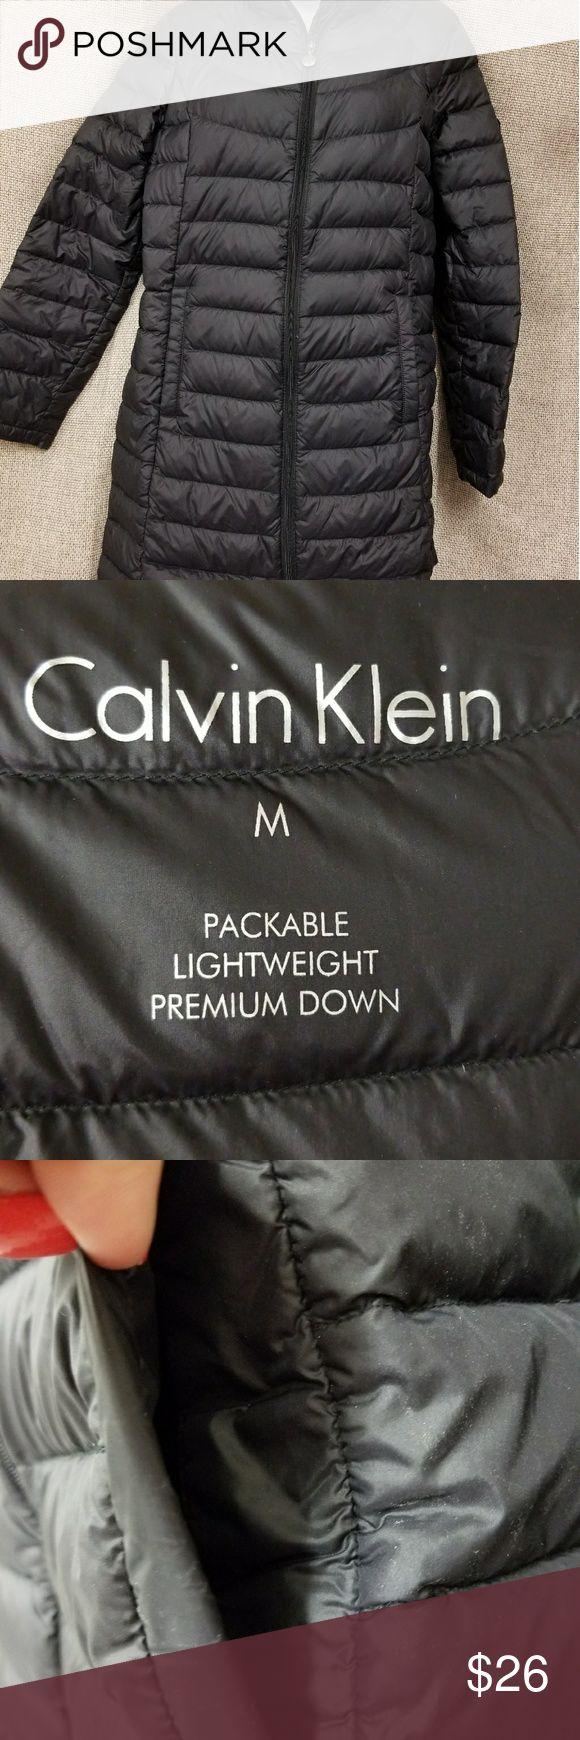 black Calvin Klein lightweight premium down coat Excellent condition. Non smoking home. #1 Calvin Klein Jackets & Coats